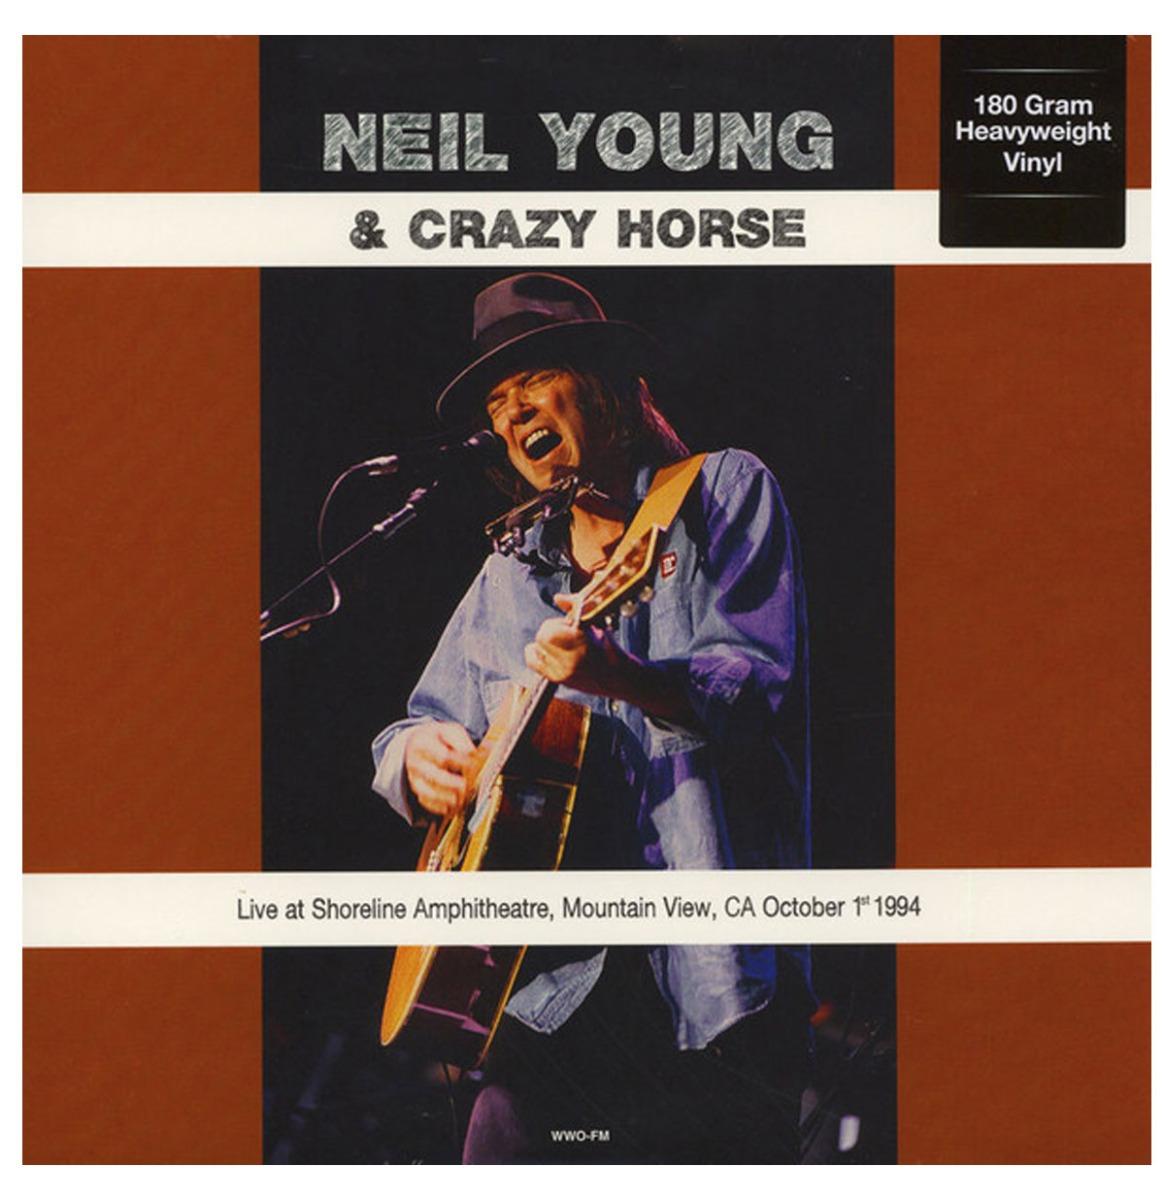 Neil Young & Crazy Horse - Live At Shoreline Amphitheatre, Mountain View, CA October 1st 1994 LP